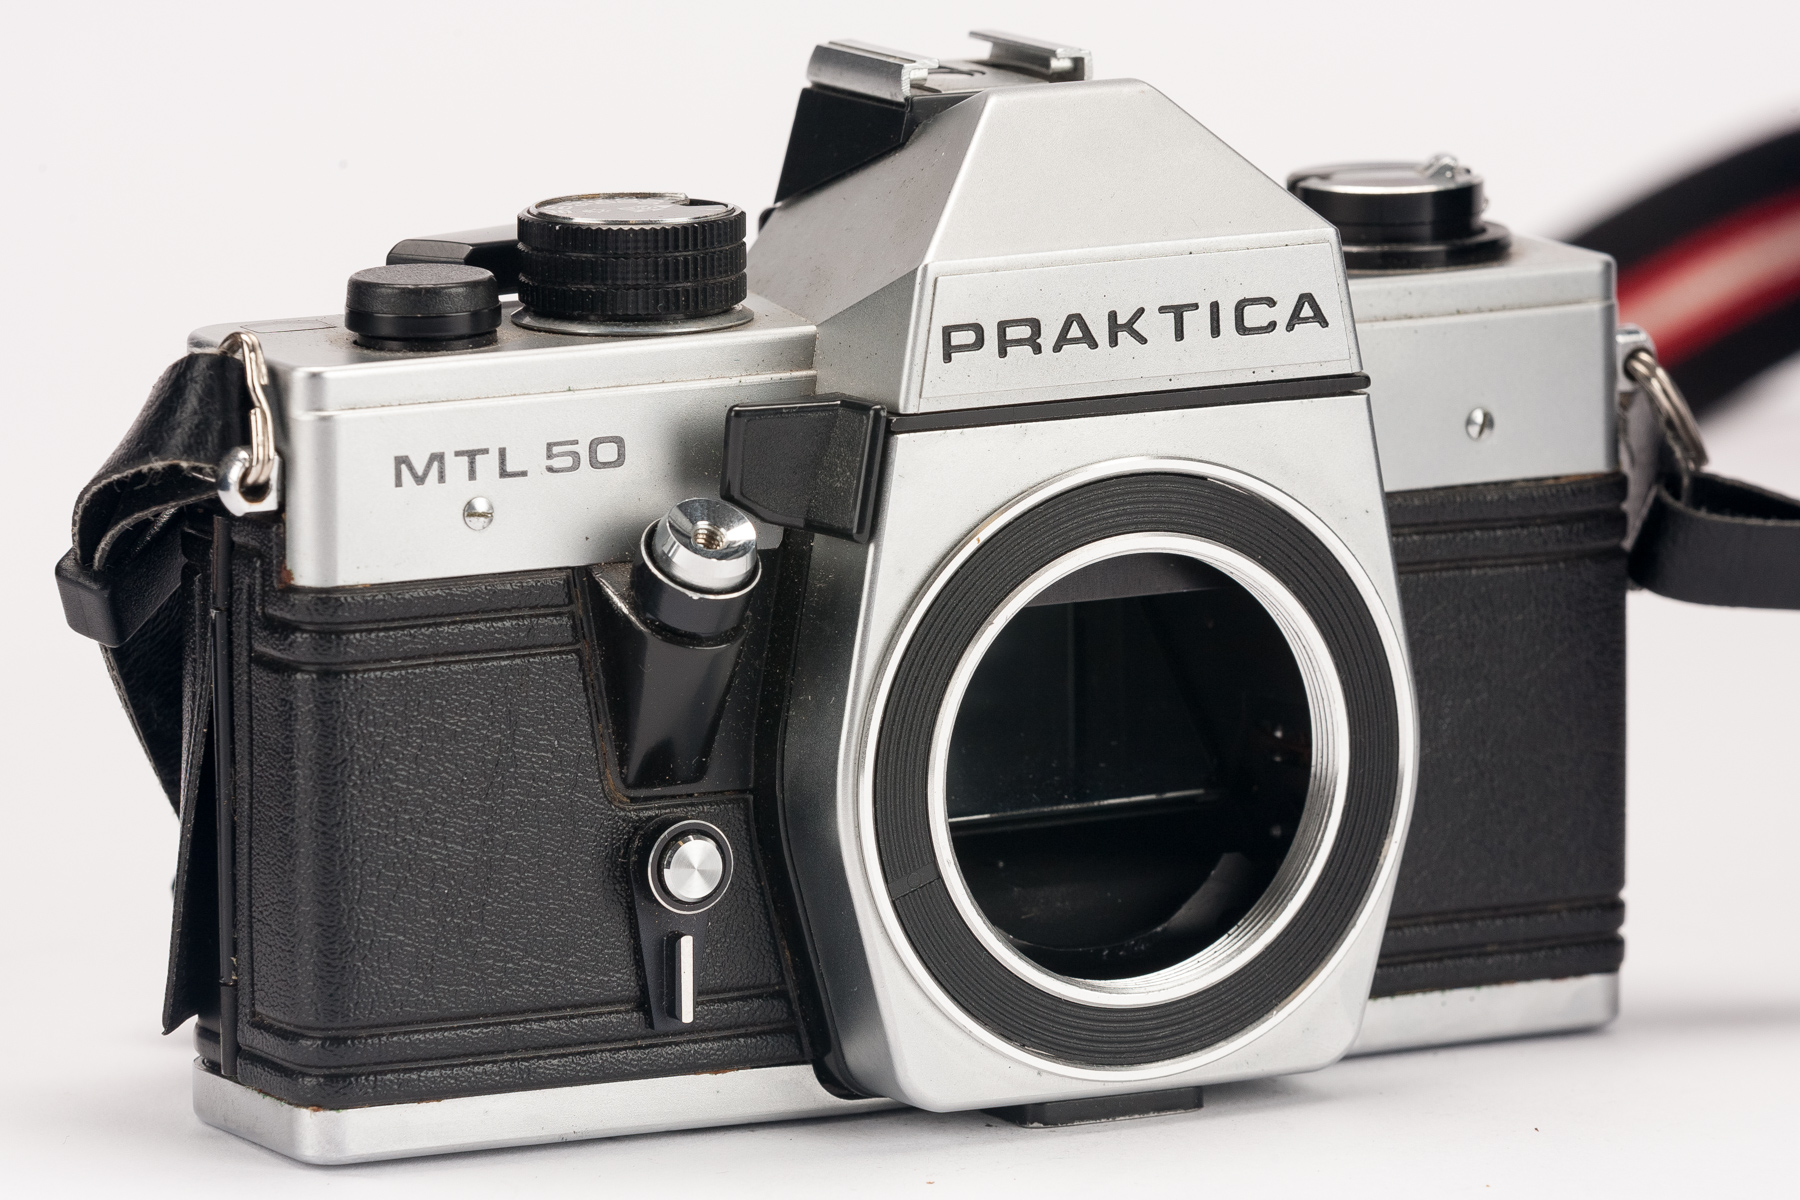 Praktica mtl 50 mtl50 slr kamera gehäuse body spiegelreflexkamera